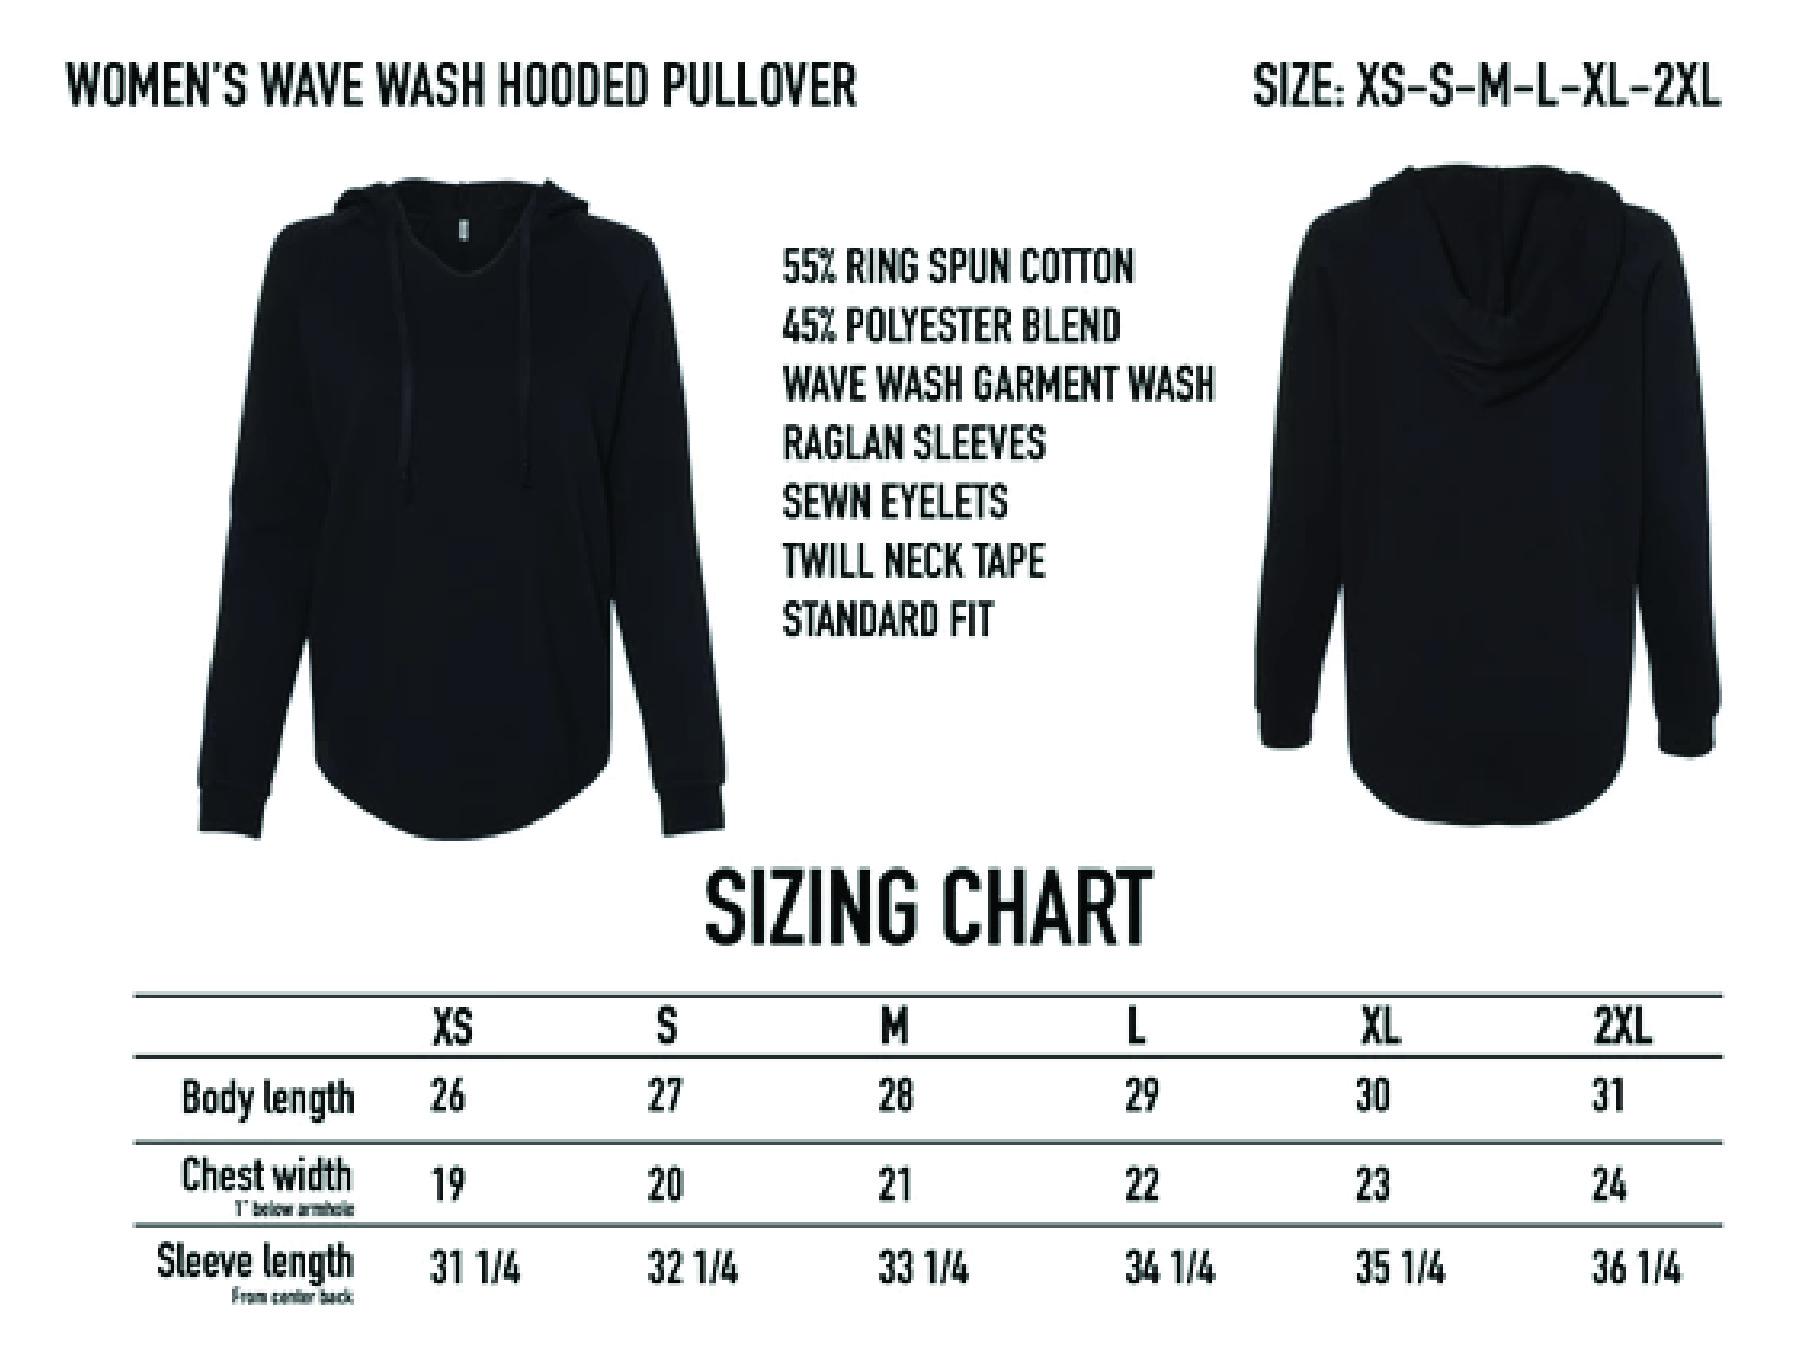 ww-hoodie-sizing-chart.jpg